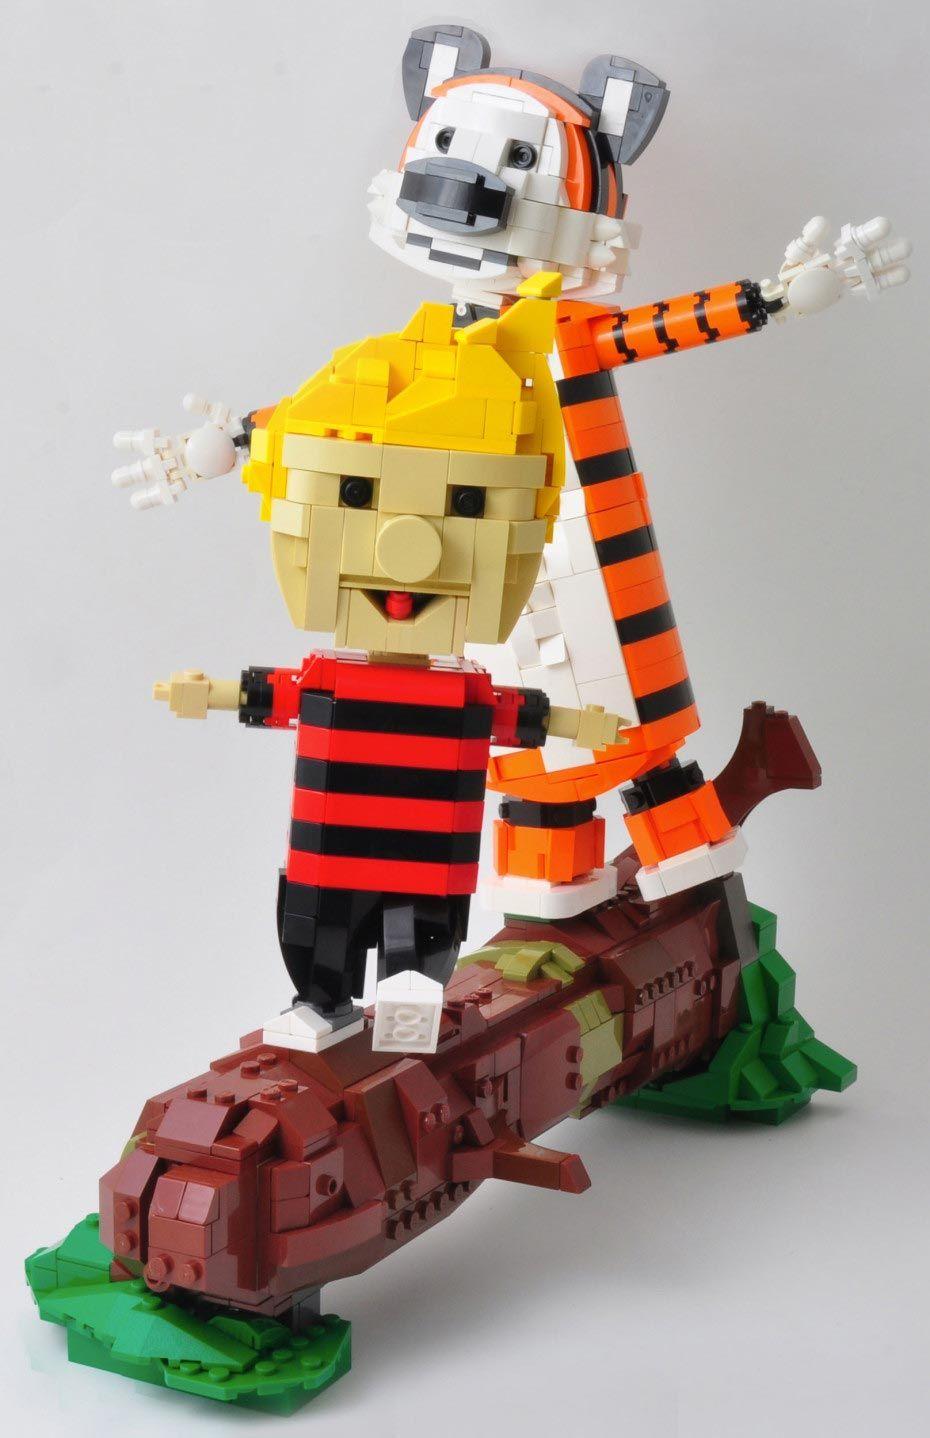 bilderparade cccxx hauptgewinn zum wochenstart cool pinterest lego anleitungen und lego. Black Bedroom Furniture Sets. Home Design Ideas